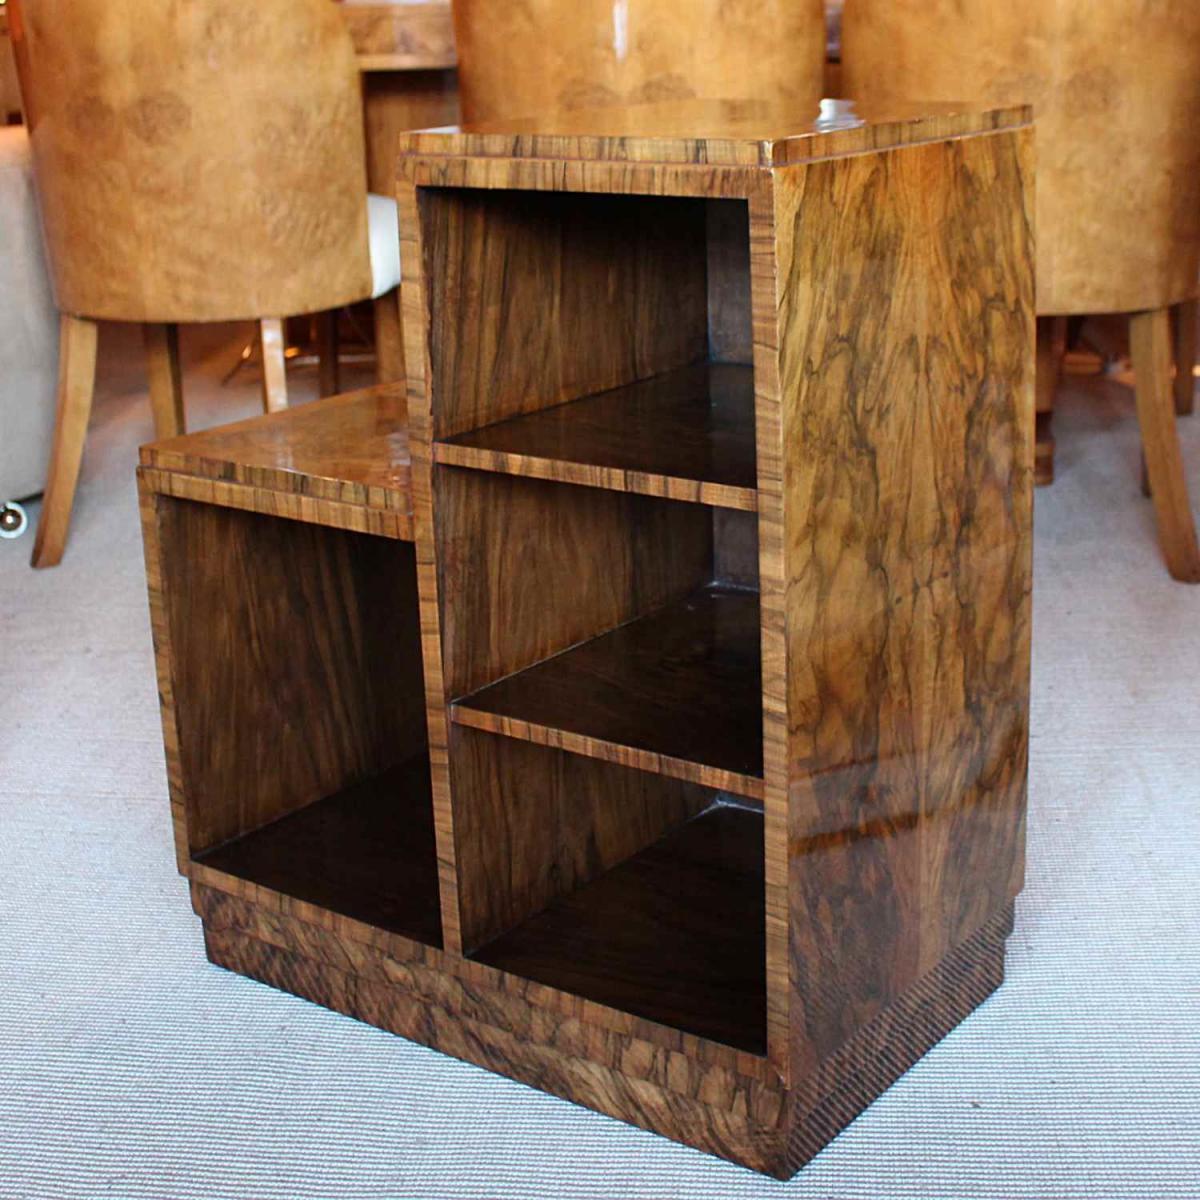 Heal's art deco bookcase